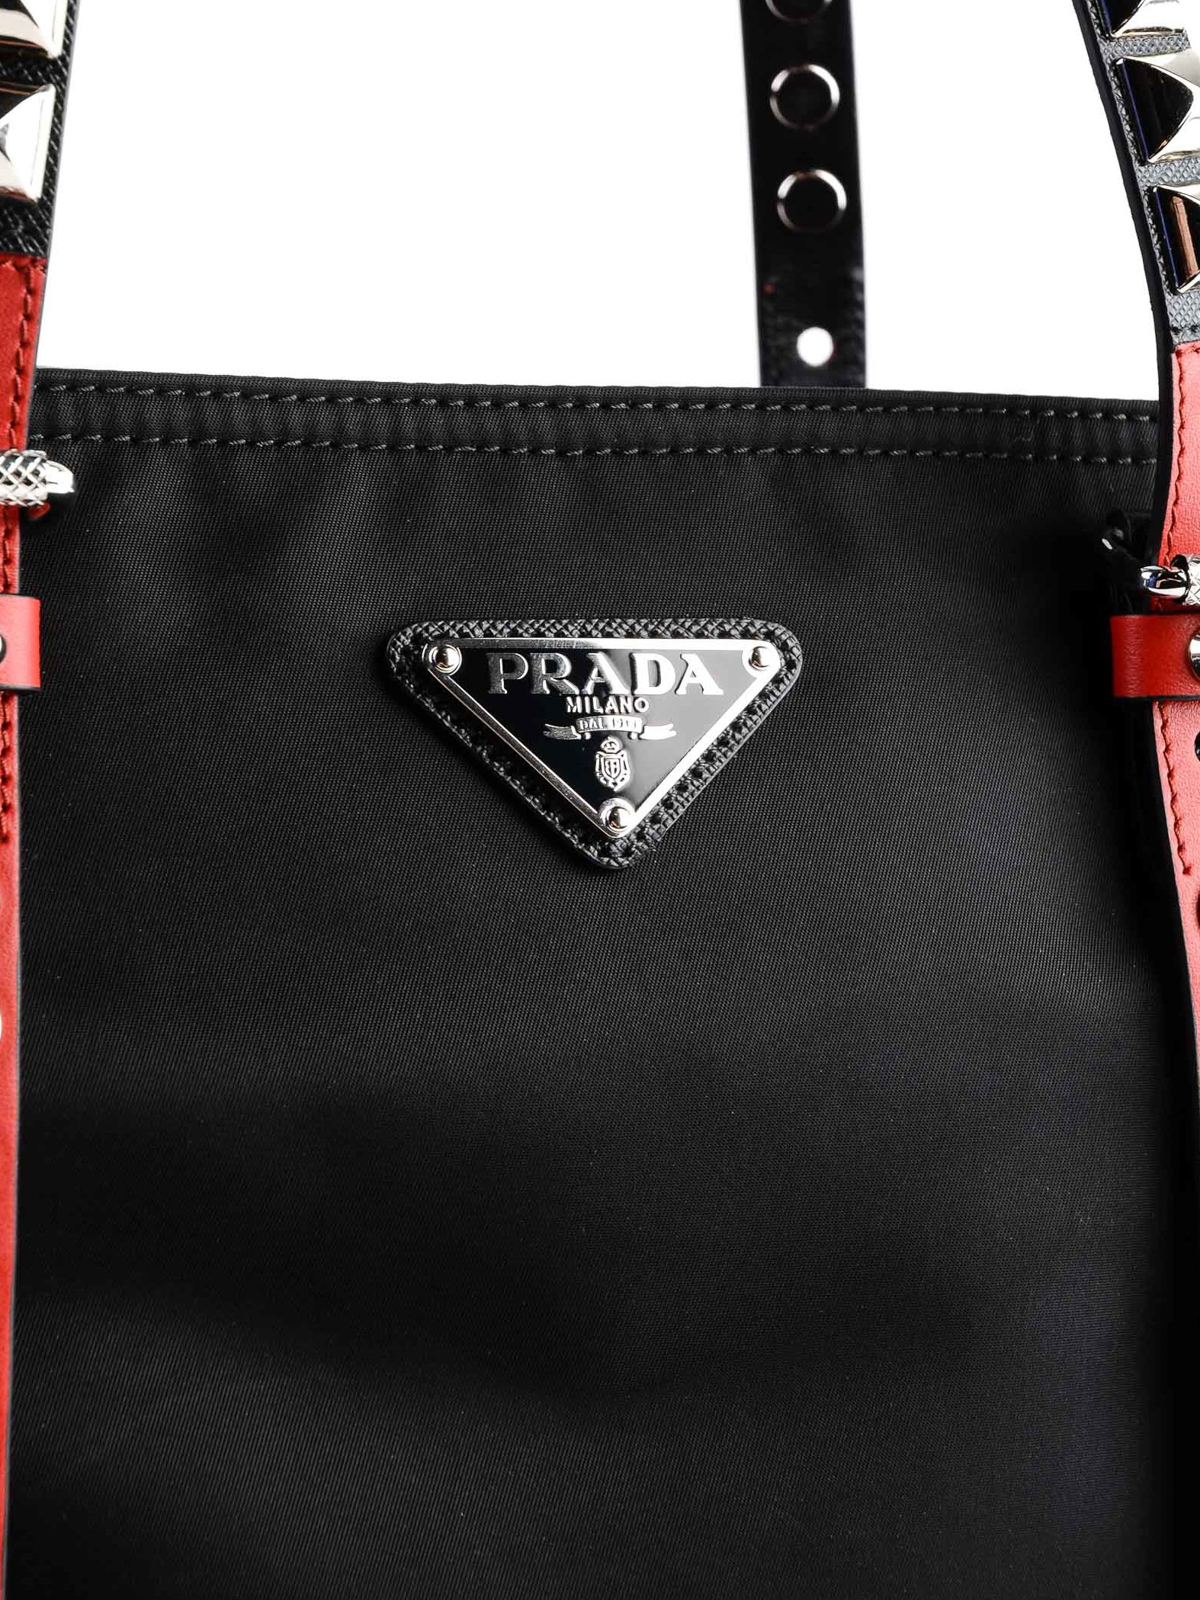 0c40b5ba57952 1bg2122bybvobo D9a Schwarz Handtaschen Shopper Prada dxWCBore